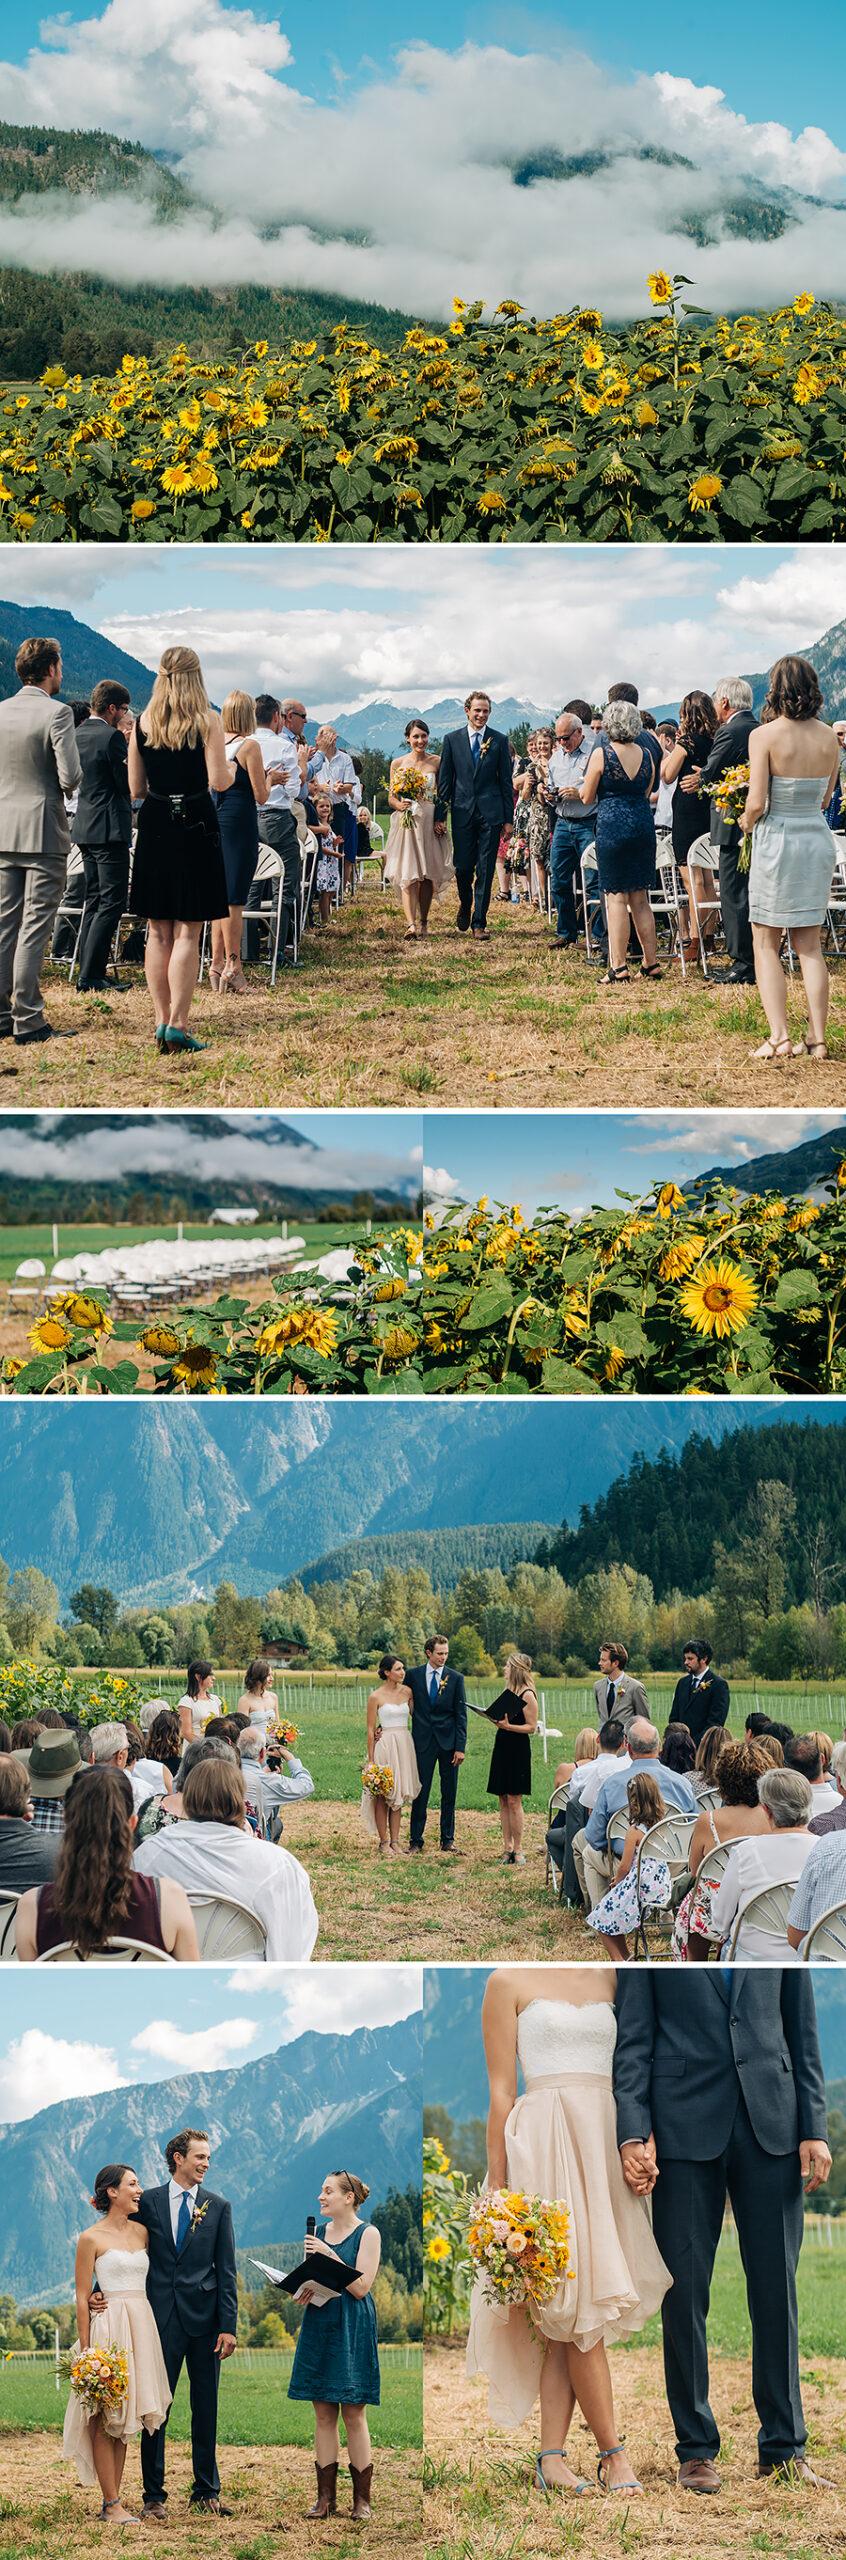 Pemberton meadows, farm wedding, ceremony